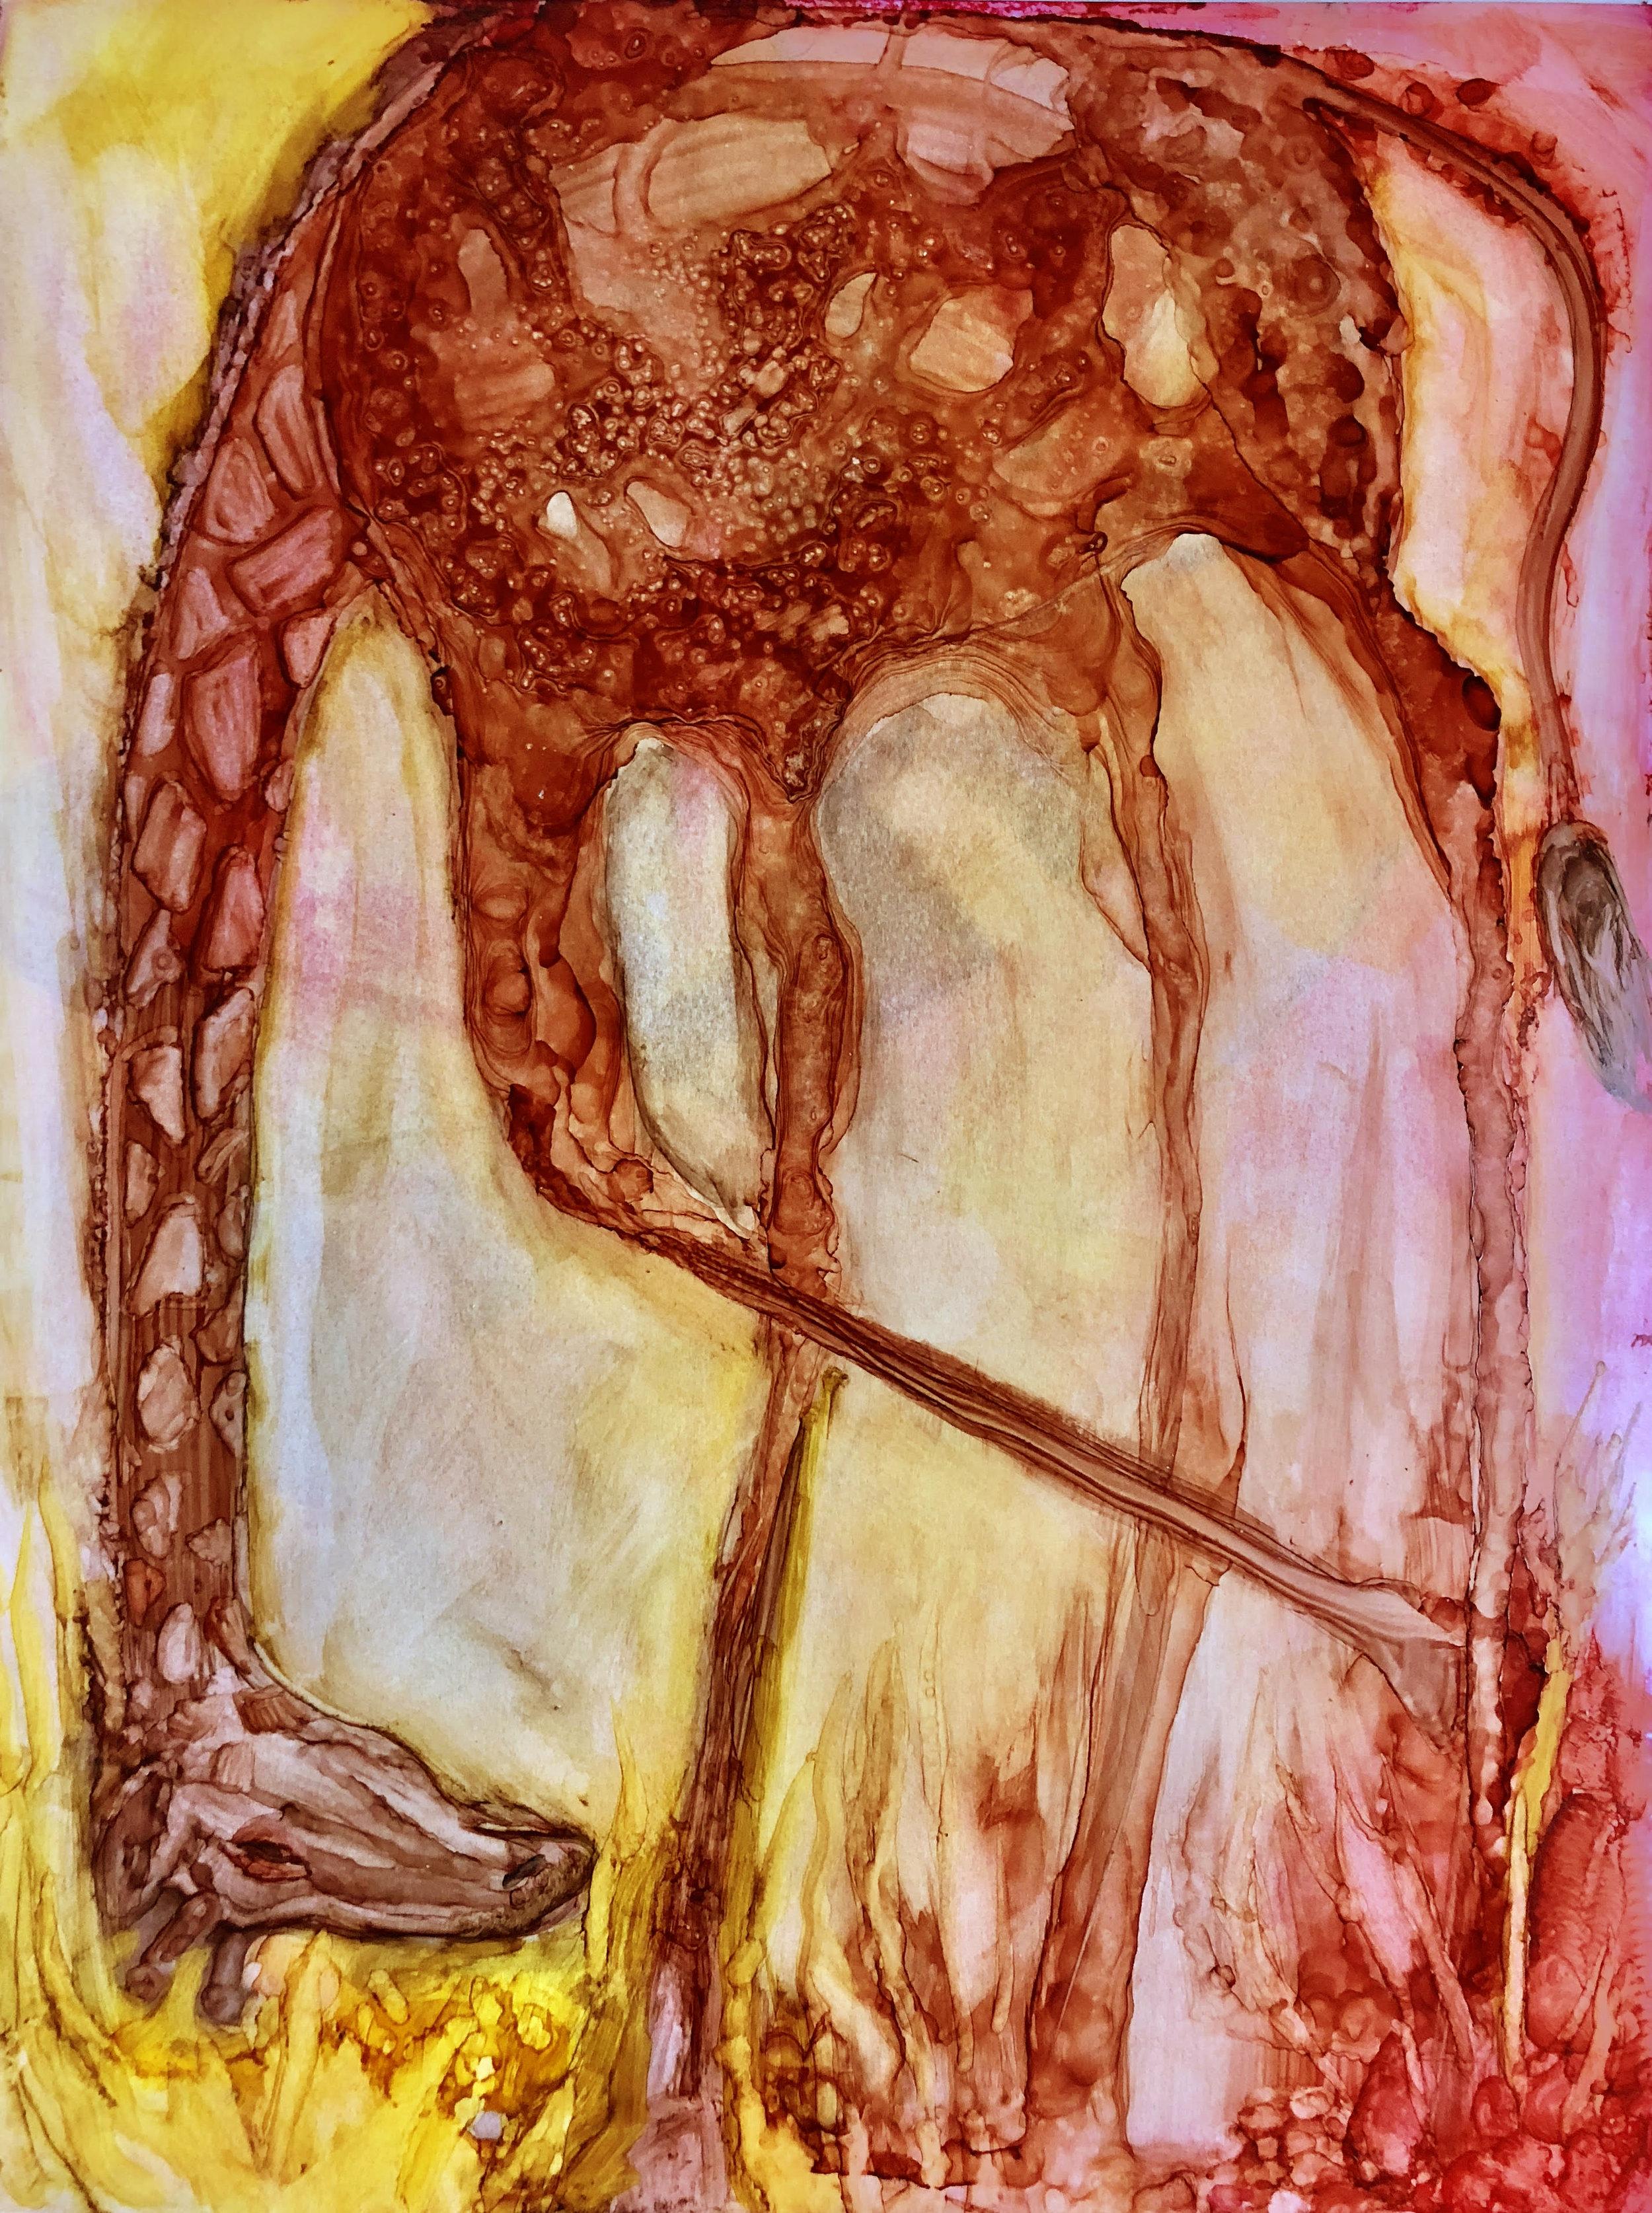 Bahar Sabsevari, زرافهی سر به زیر , Ink on paper, 9 x12 inches, 2018